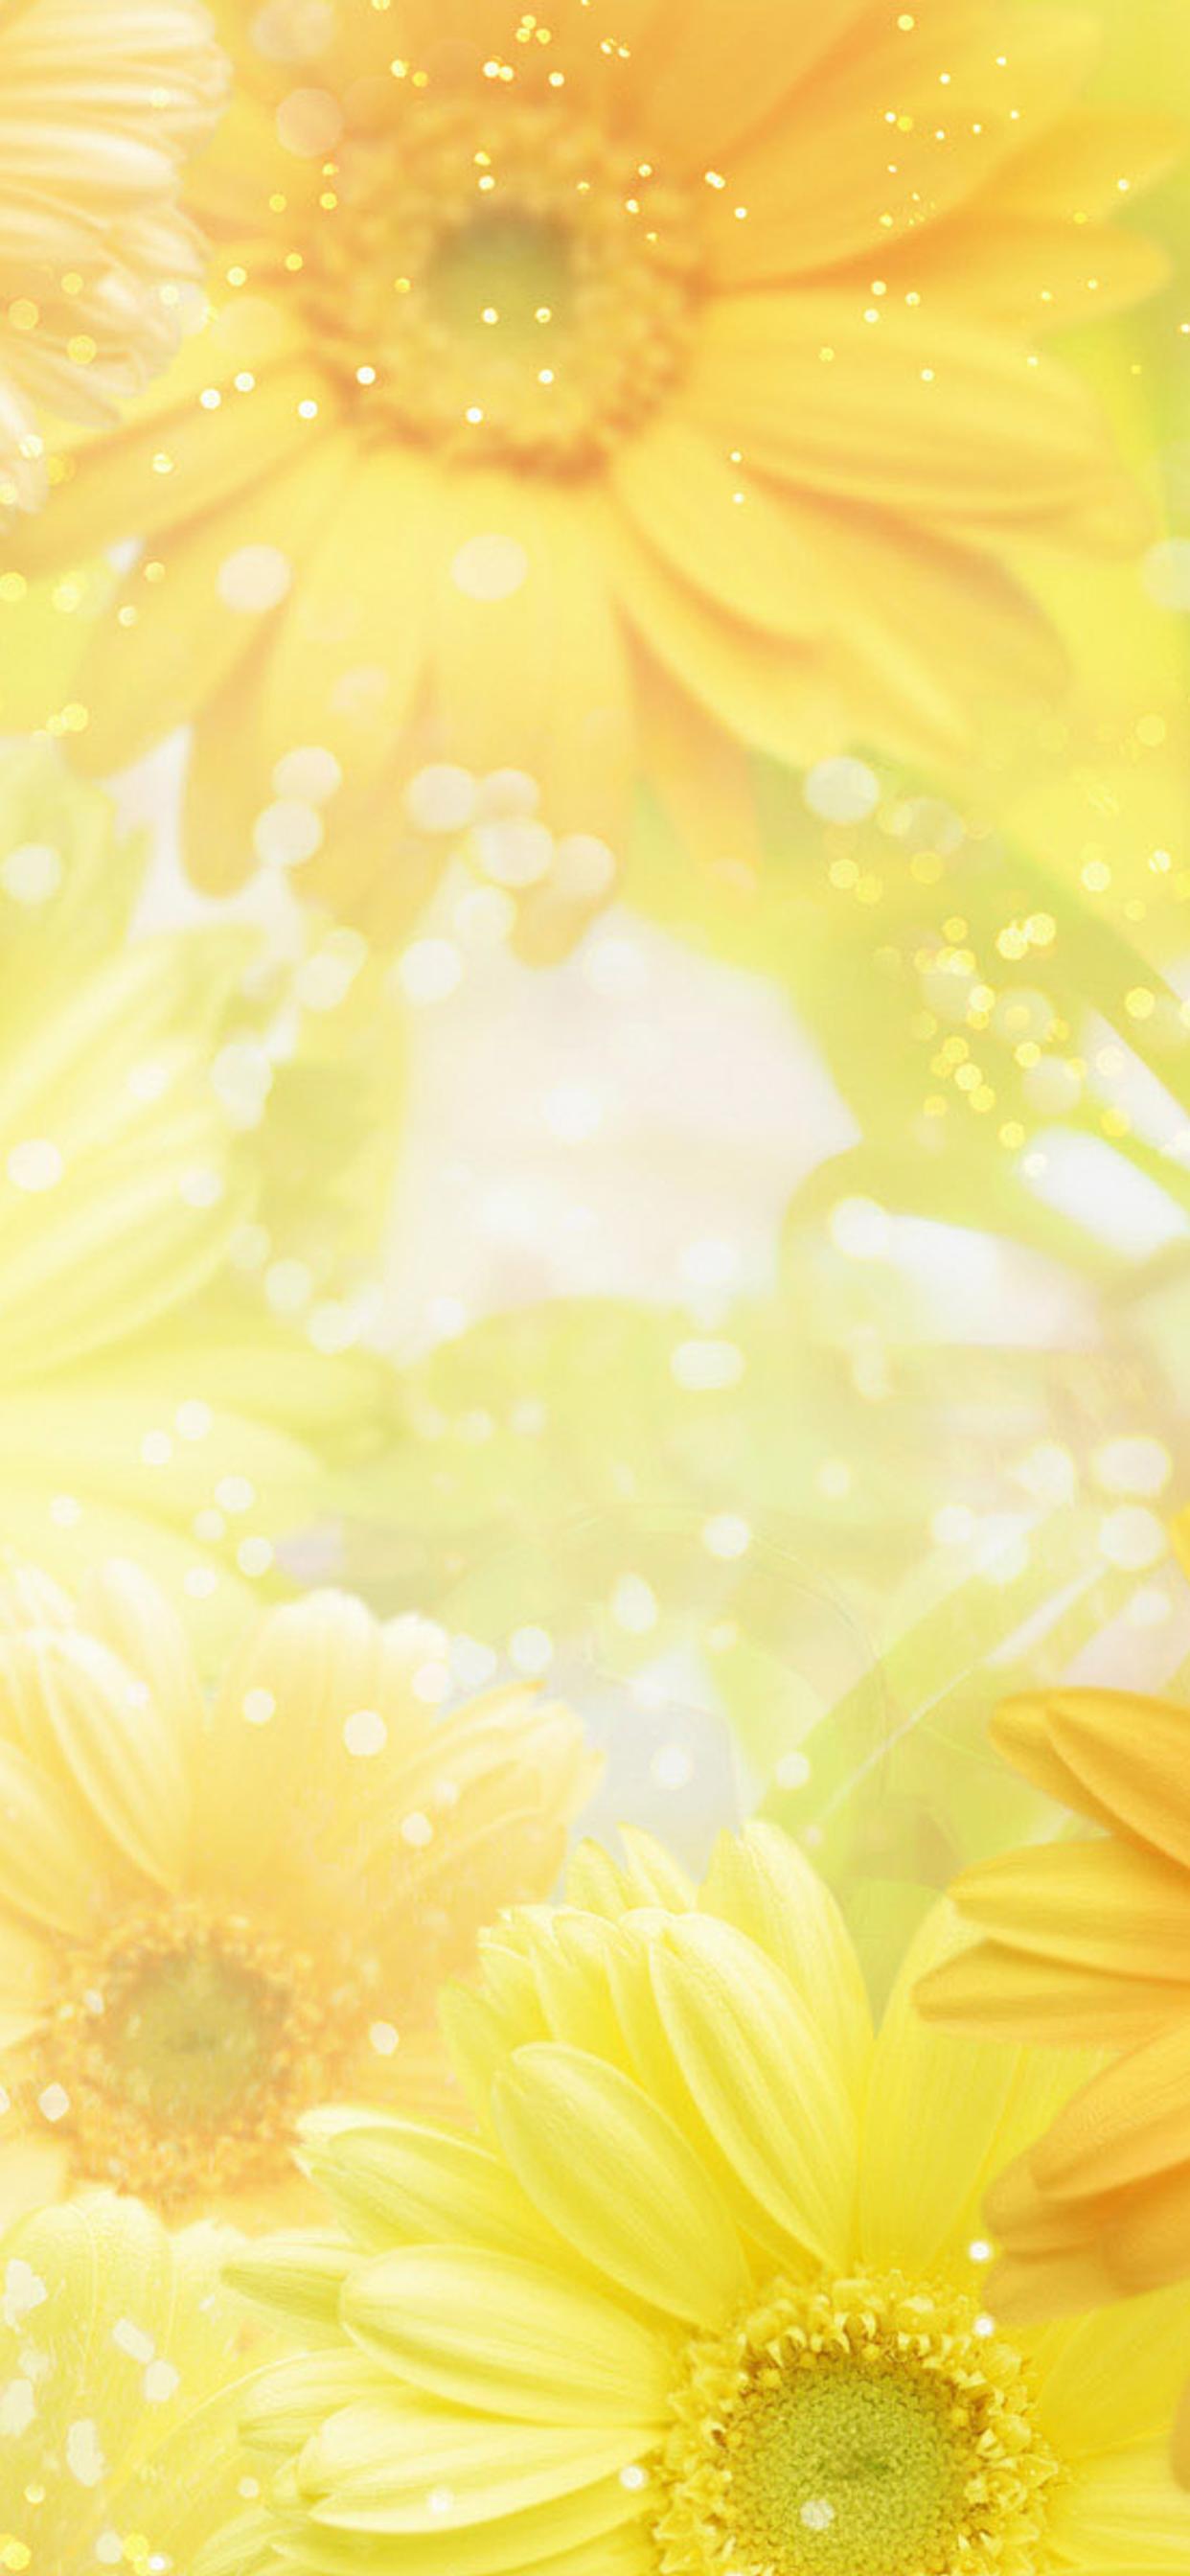 Wonderful Yellow Flowers On The Screen Hd Wallpaper